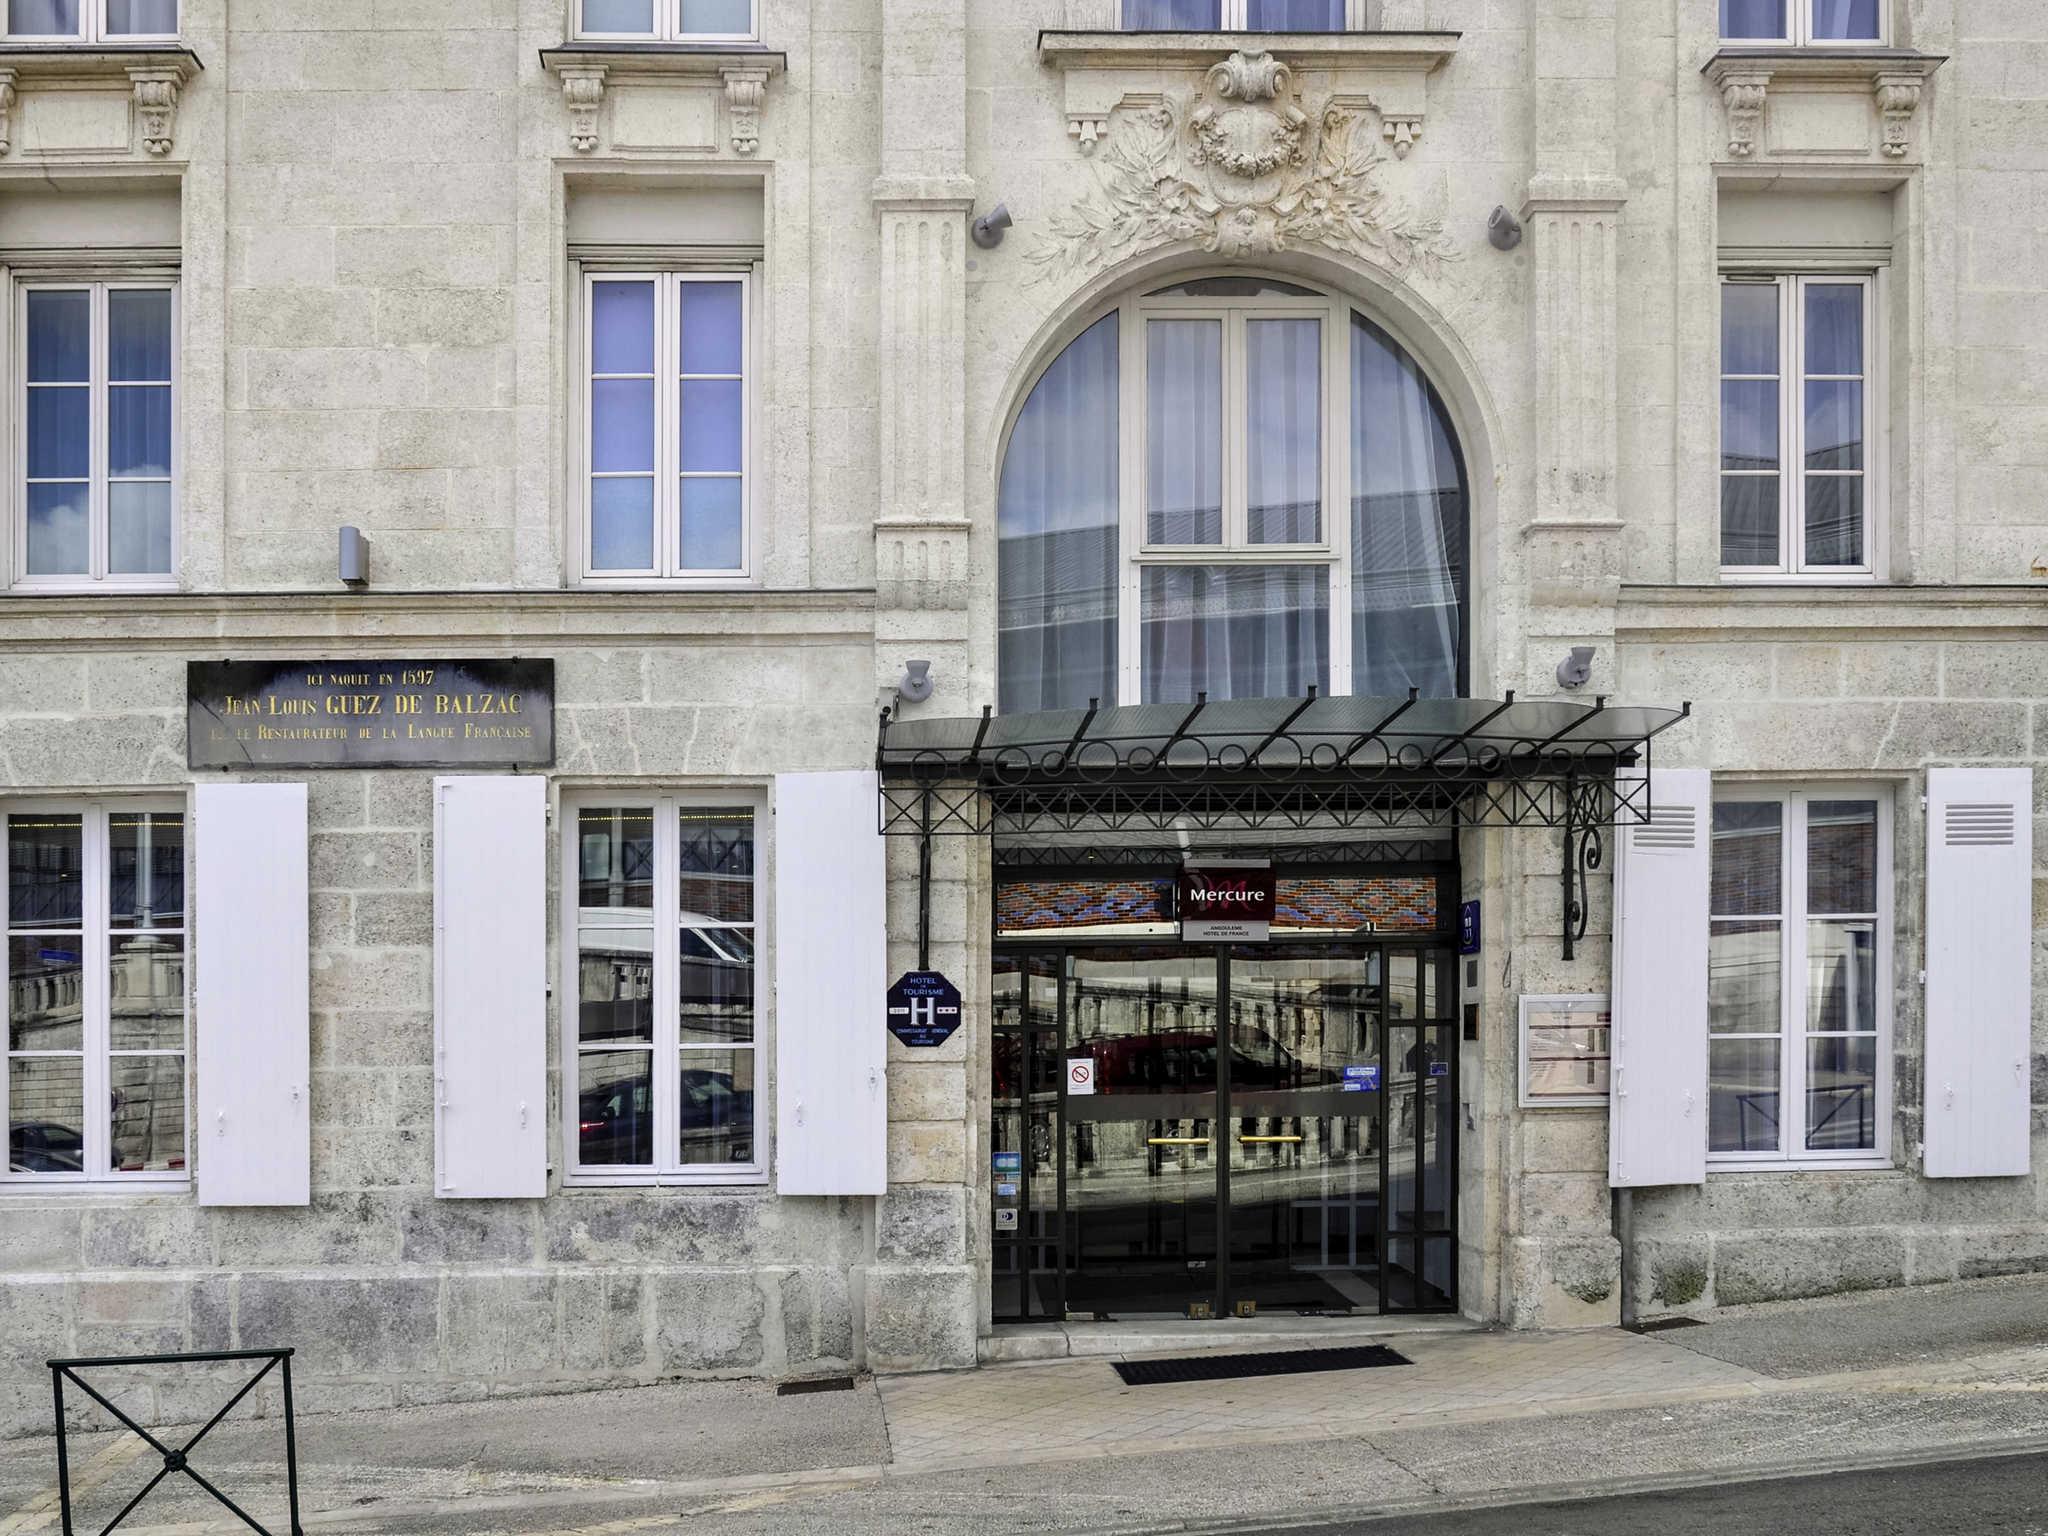 Отель — Hôtel Mercure Angoulême Hôtel de France